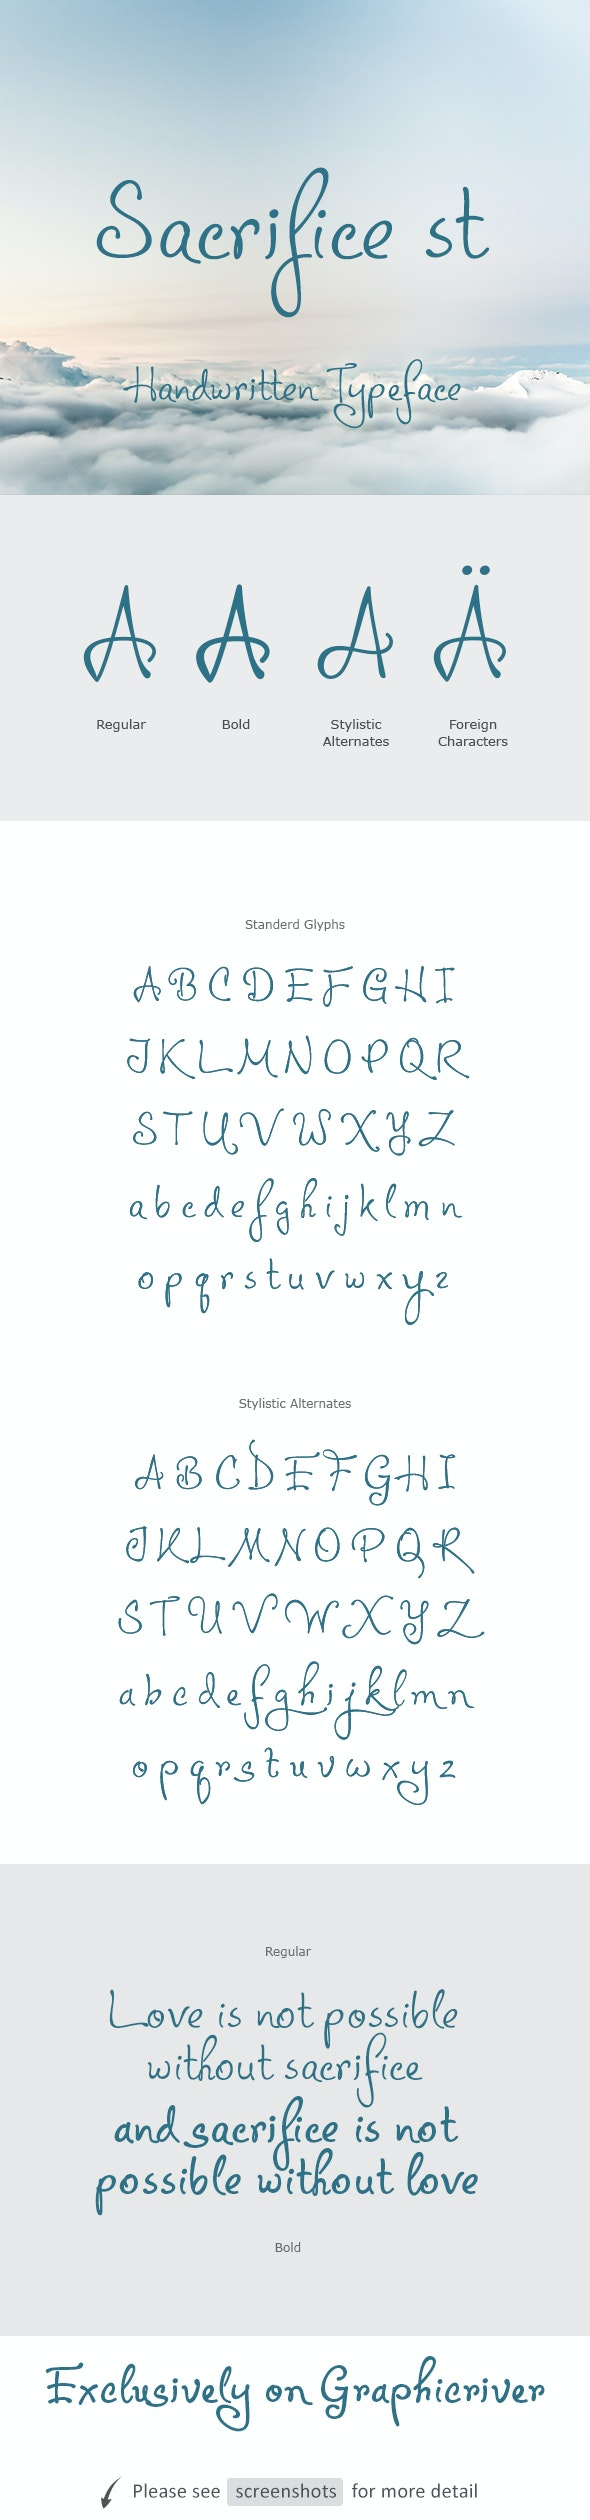 Sacrifice st - Hand-writing Script